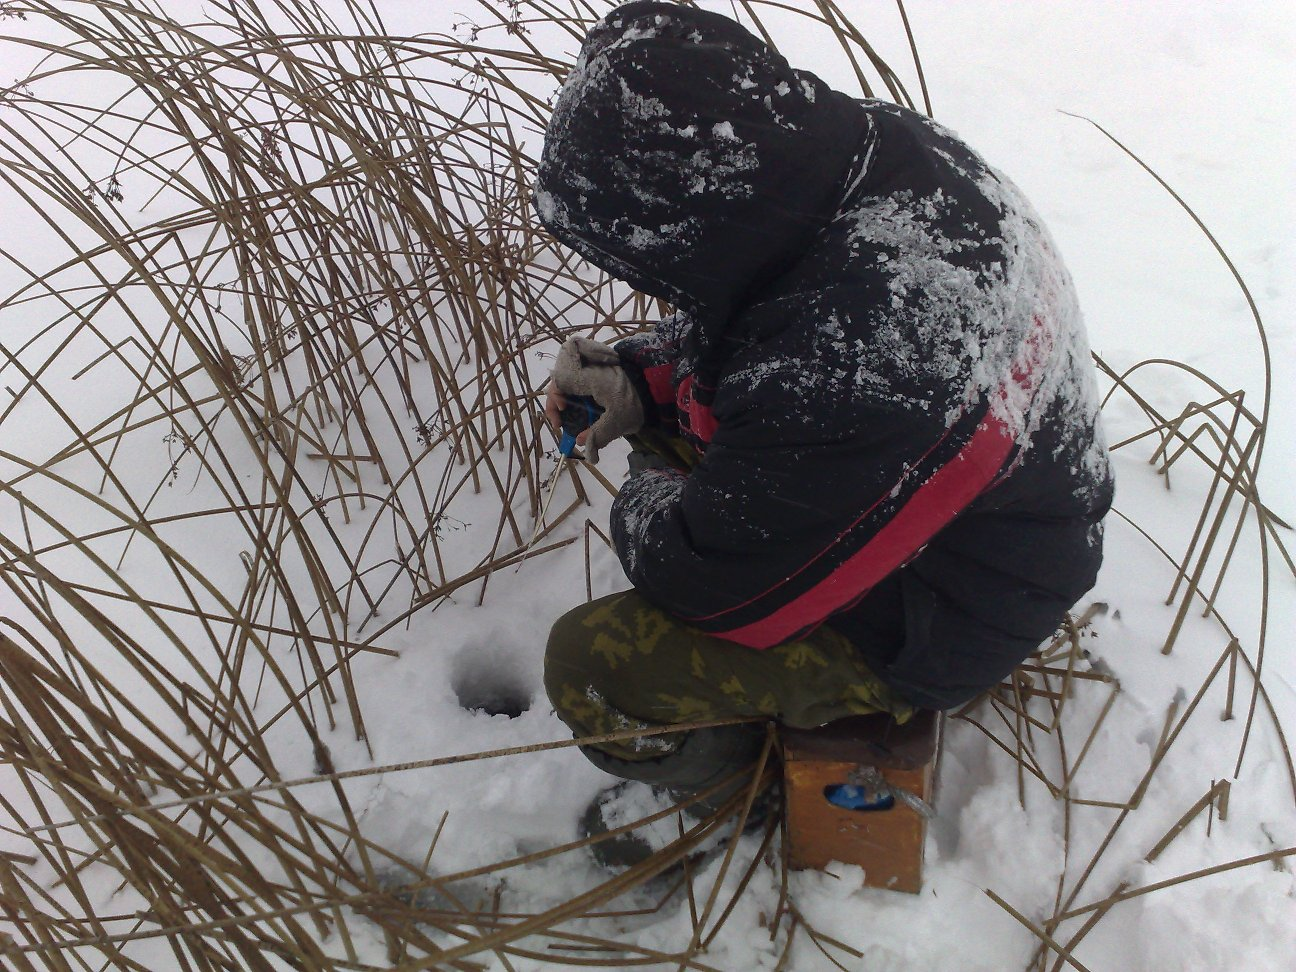 Ловля плотвы зимой на мормышку.